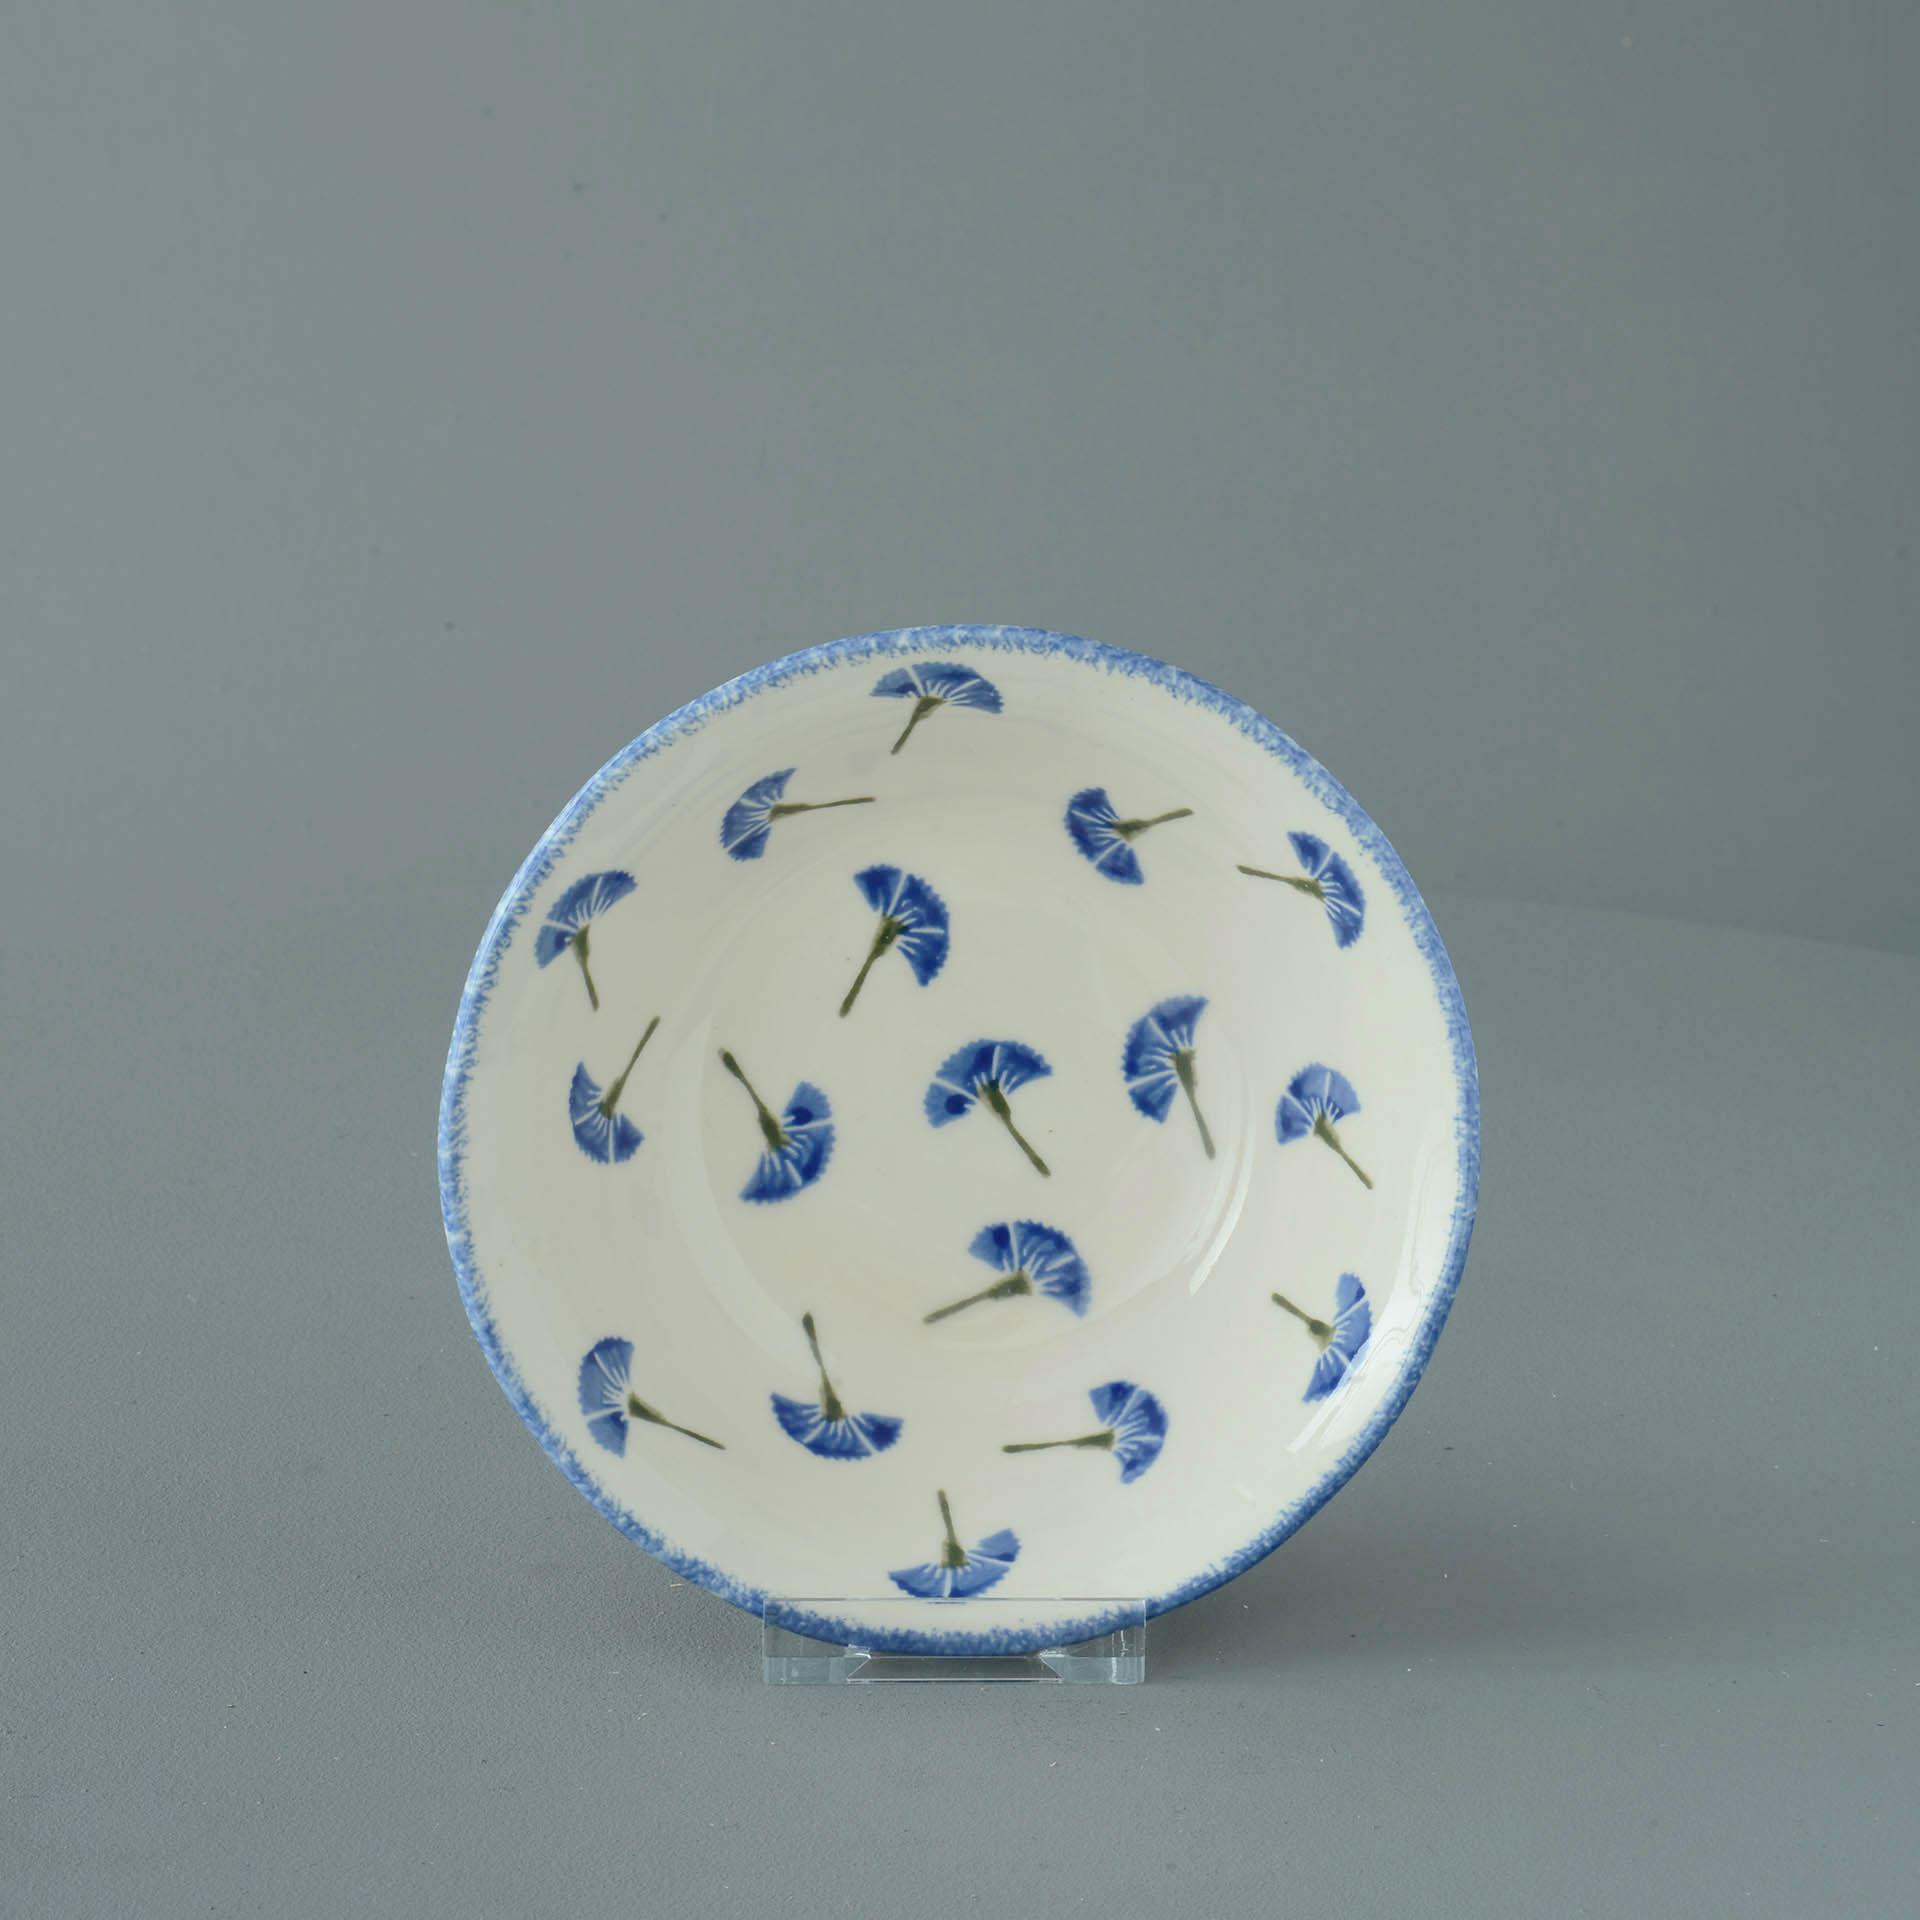 Cornflower Baby Bowl 4.5 x 15cm